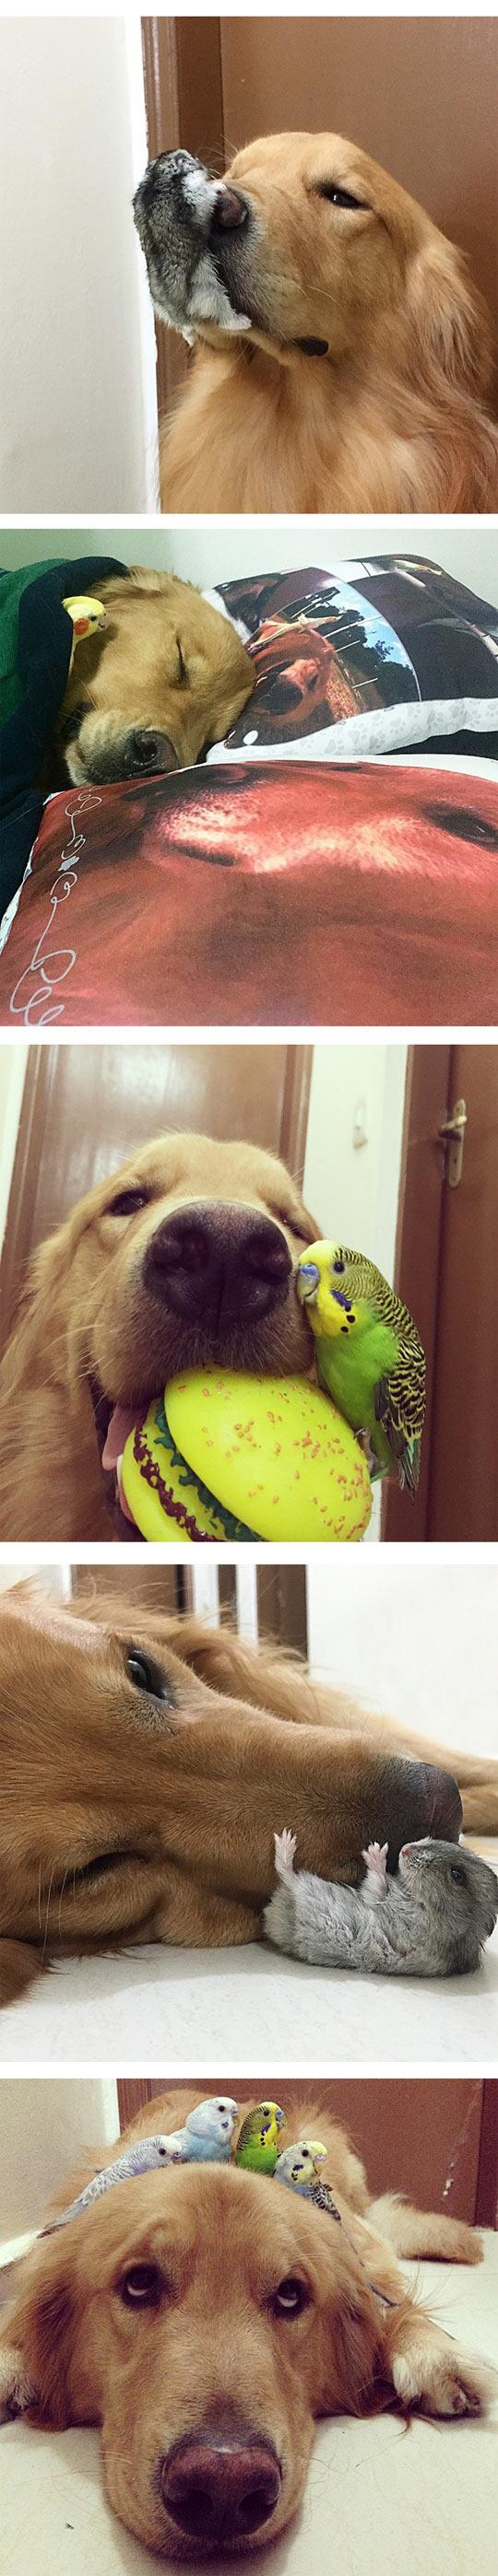 funny-Bob-dog-bird-friends